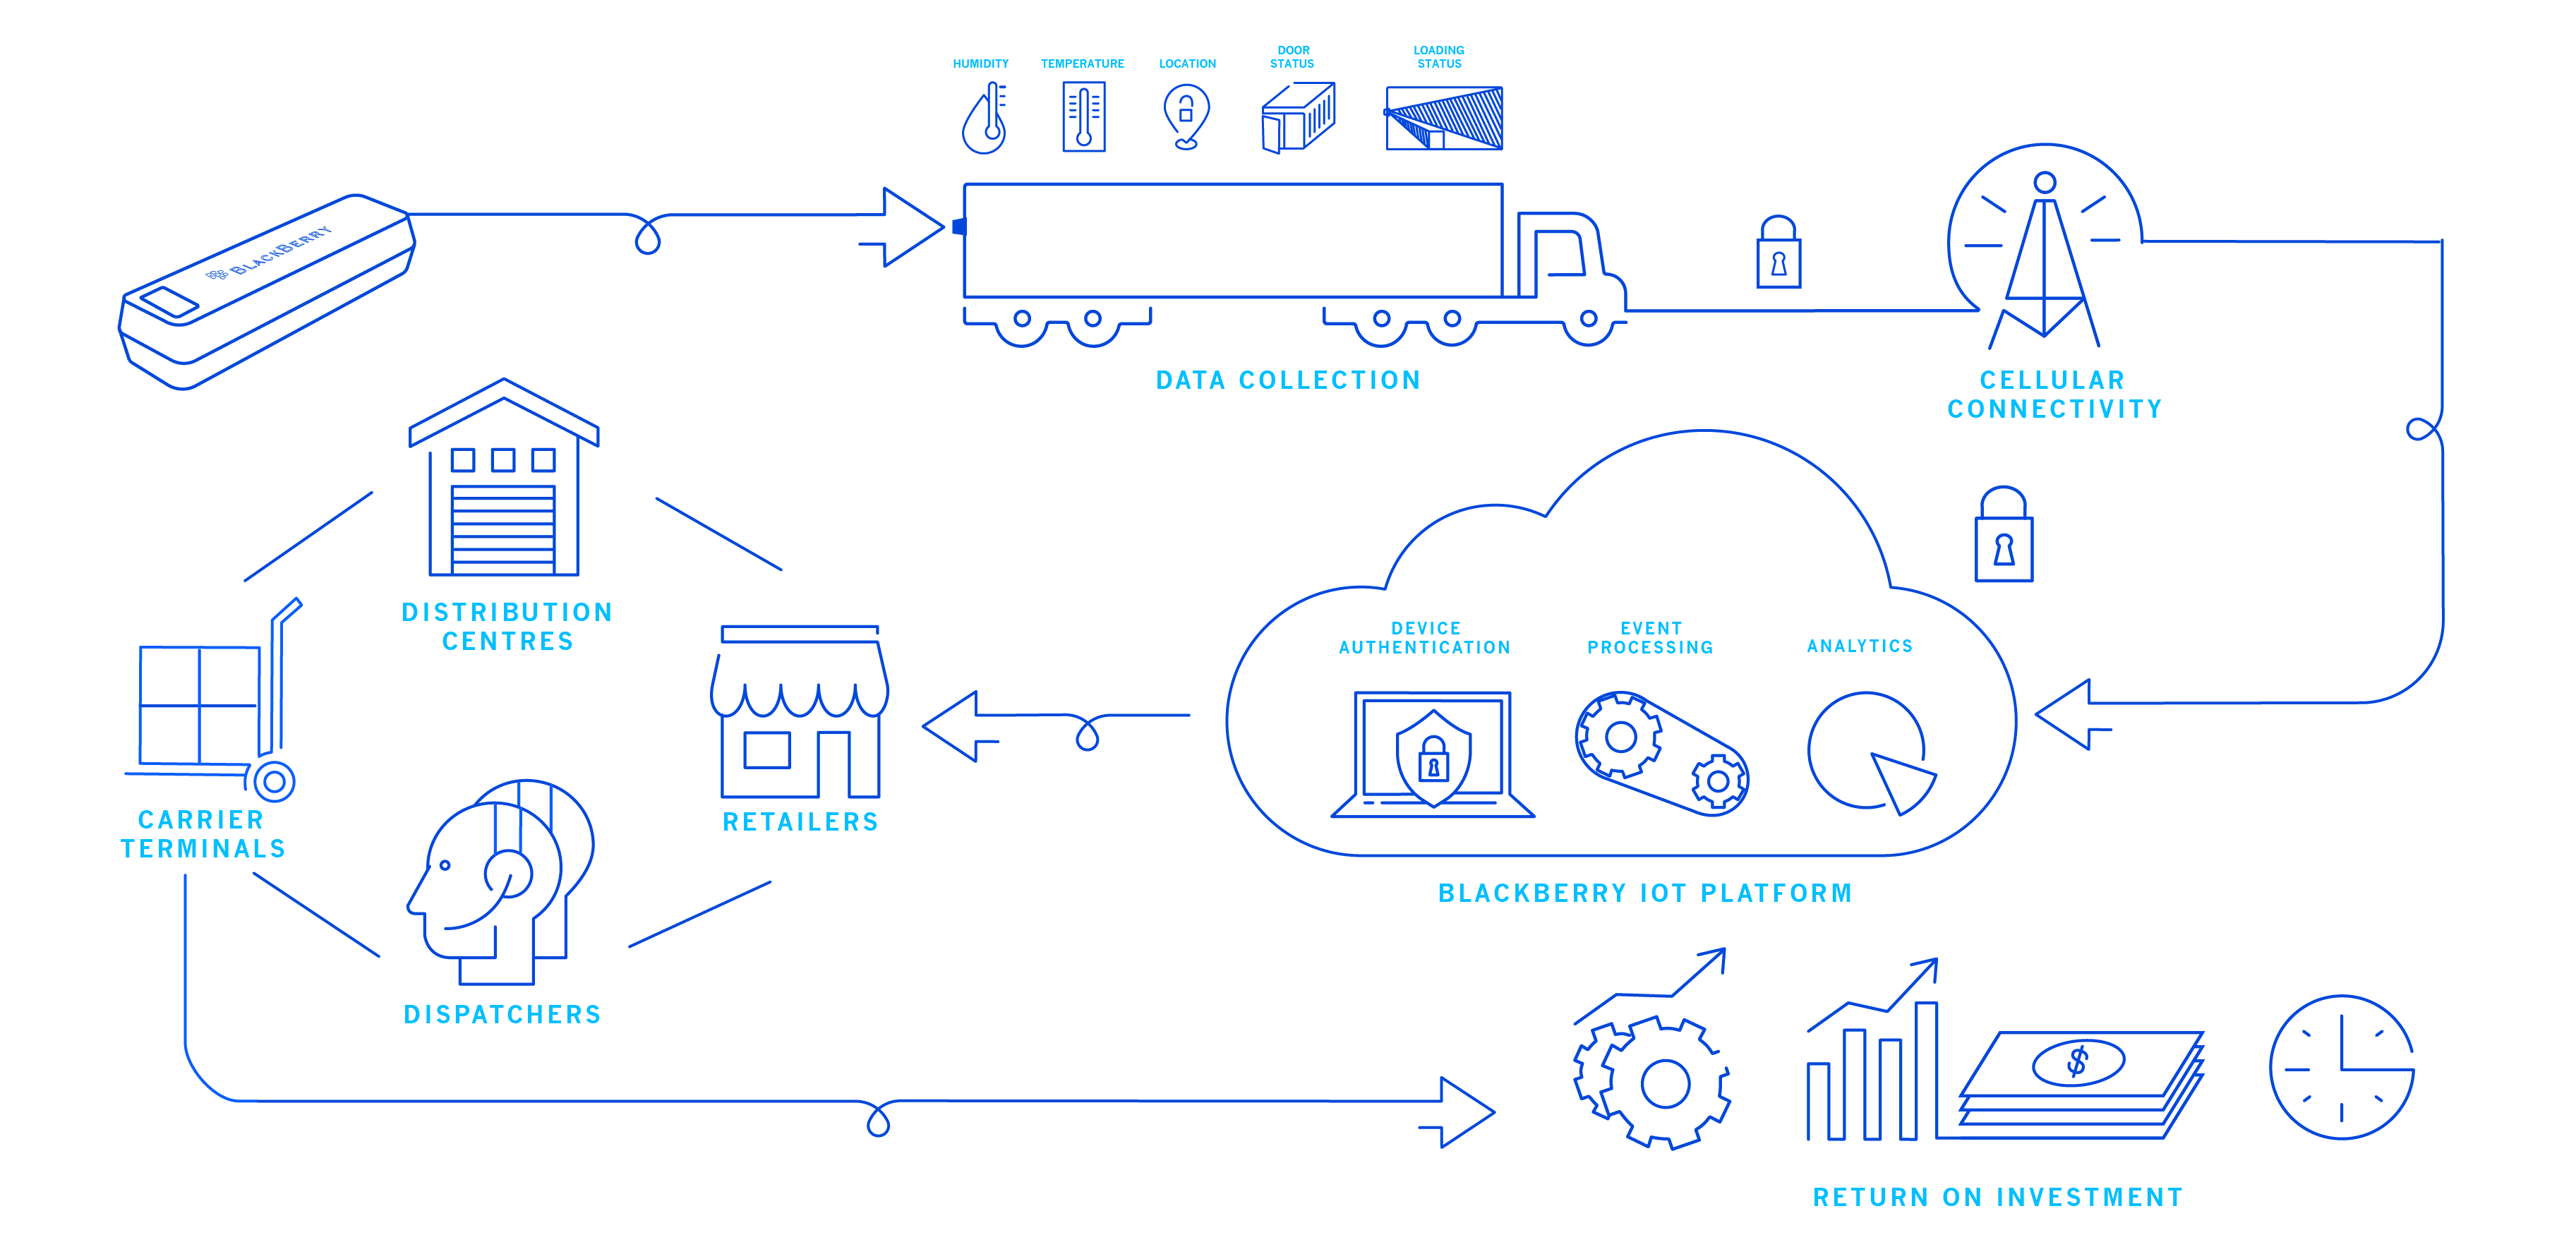 blackberry_radar_asset_tracking-solution_infographic-crop